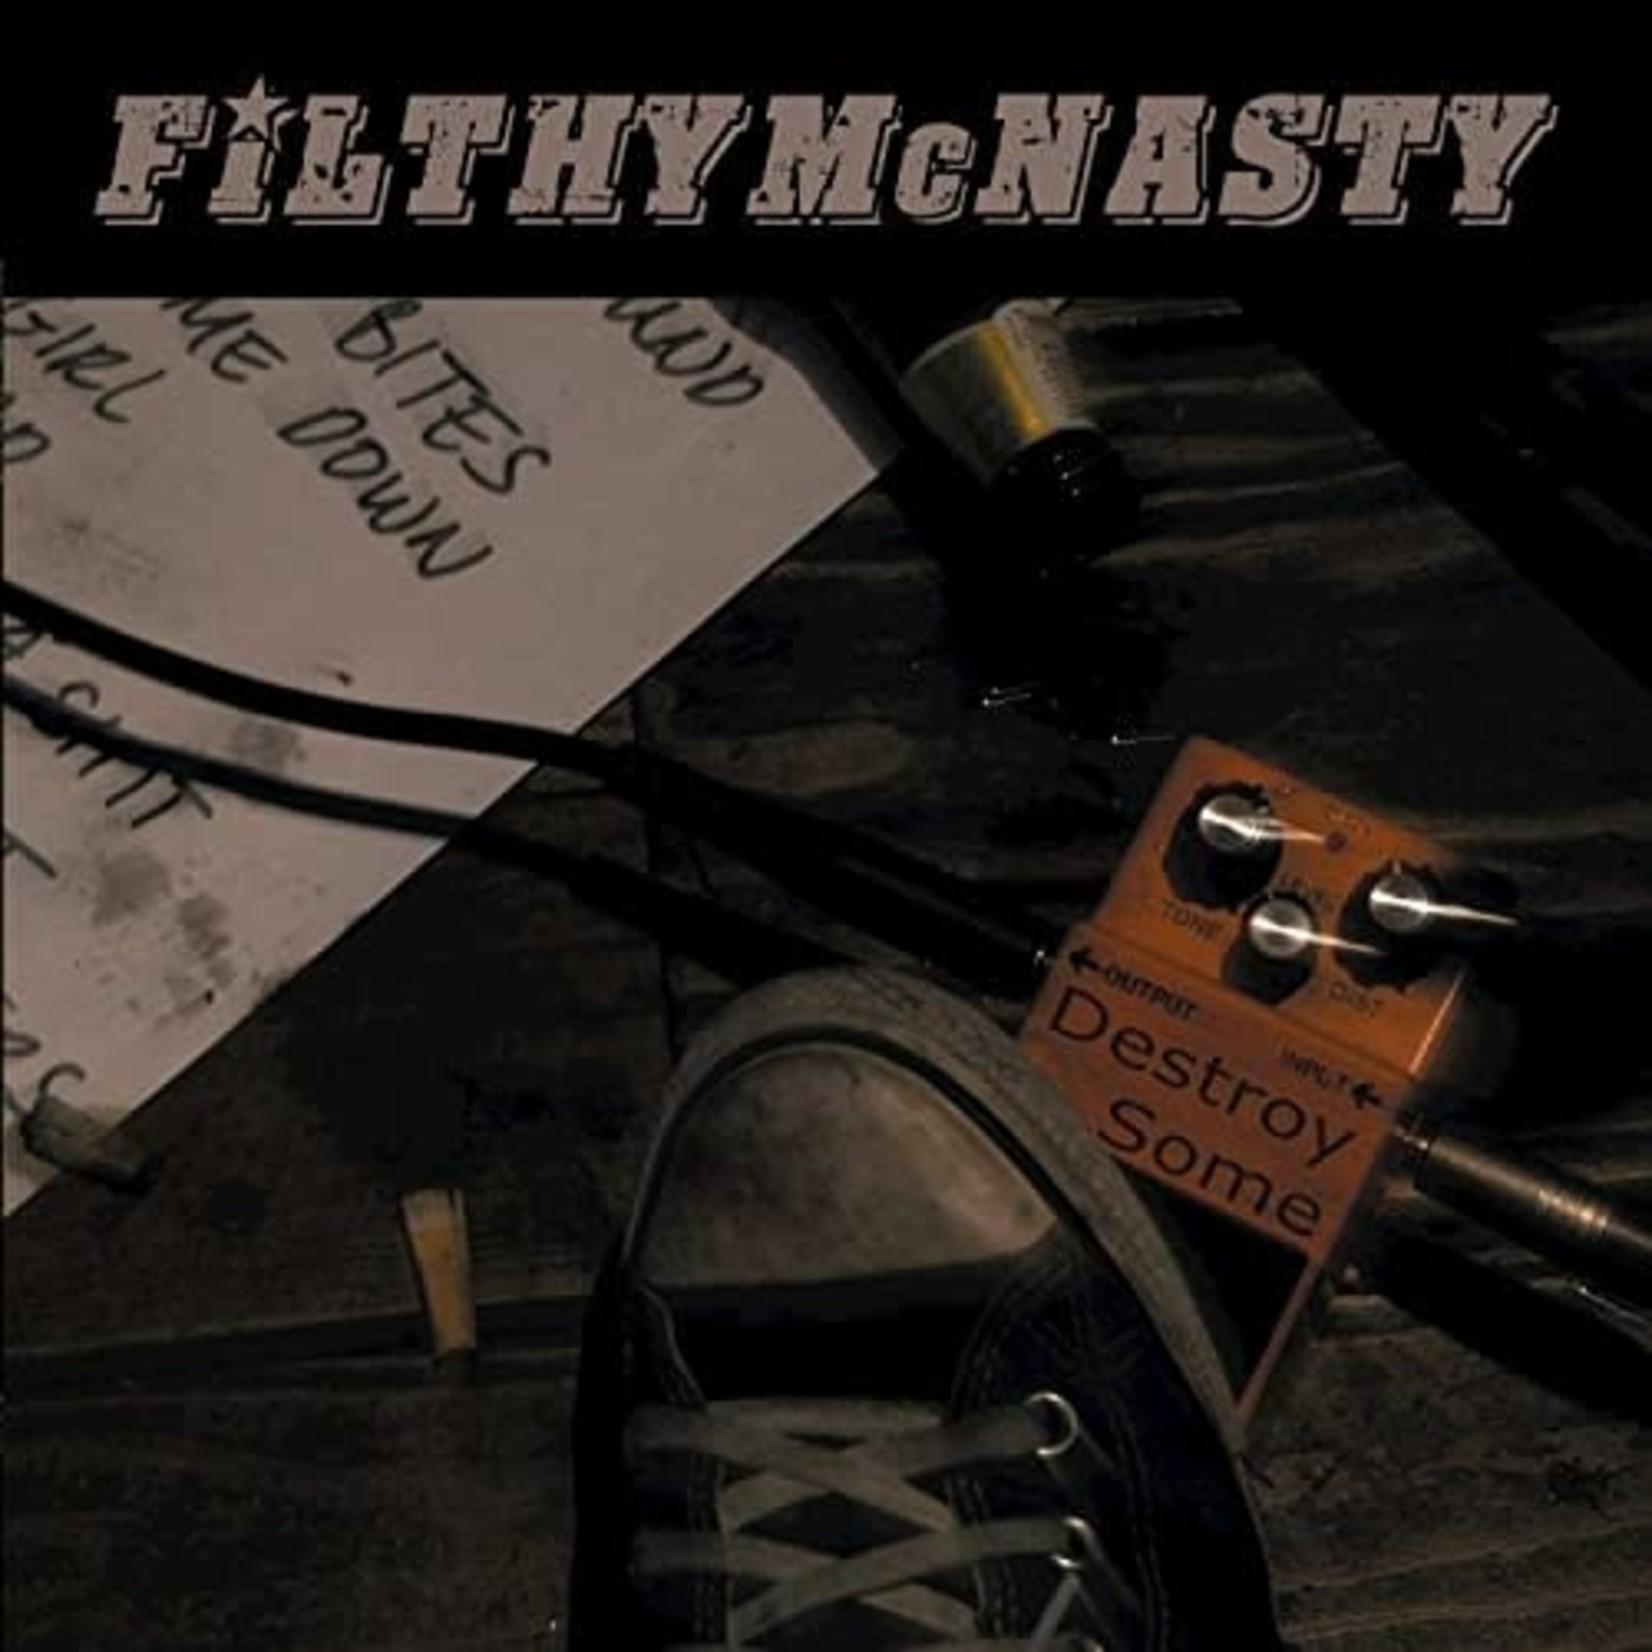 FILTHY MCNASTY - Destroy some (groen vinyl)   (VINYL)